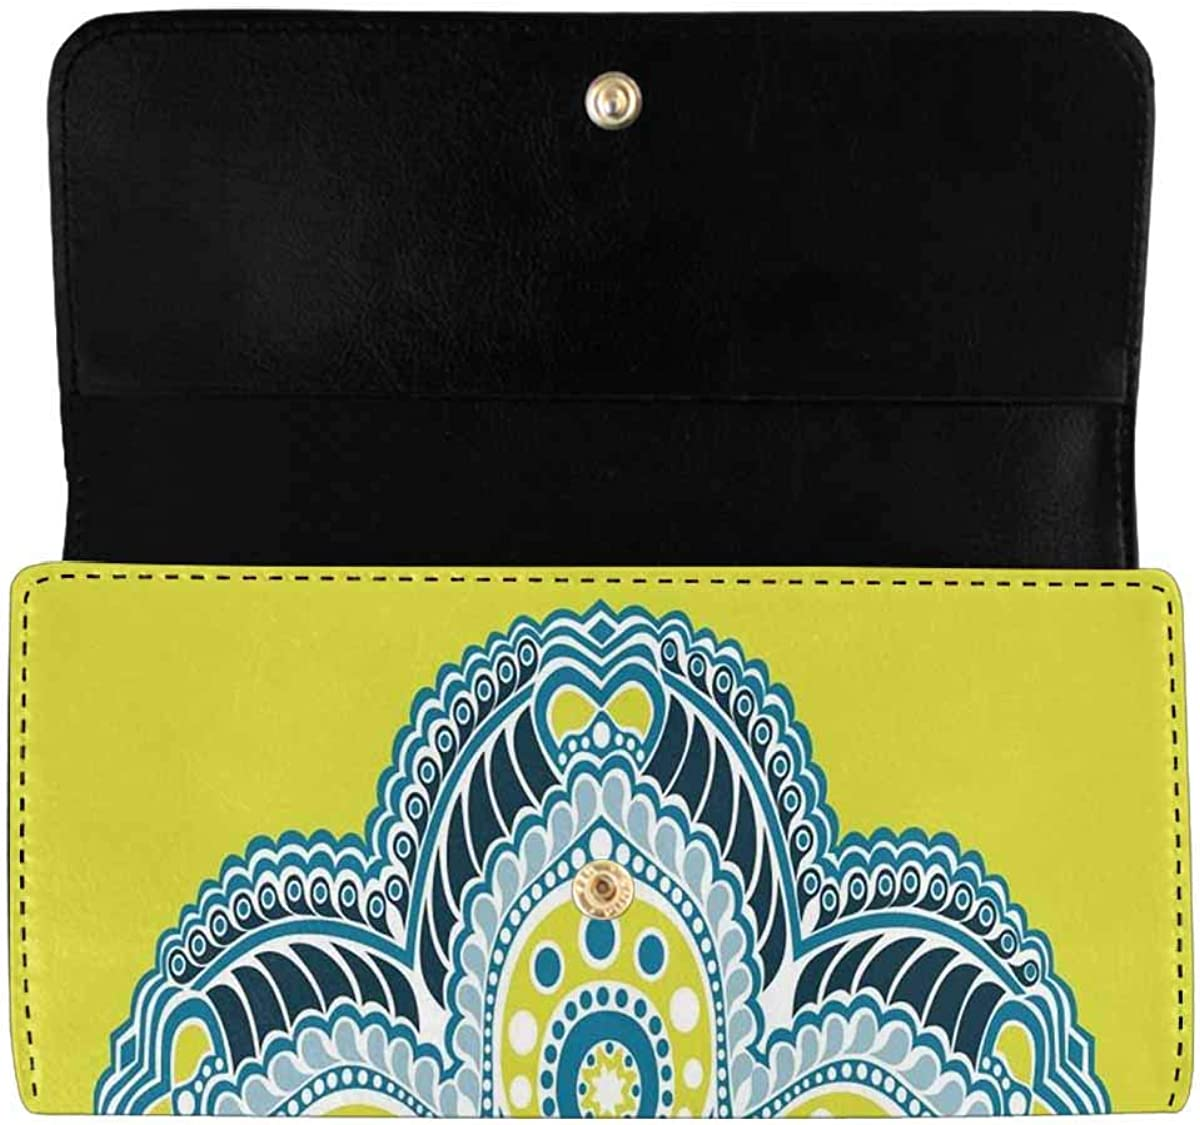 INTERESTPRINT Women's Long Clutch Wallets Floral Mandala Pattern Trifold Card Holder Purses